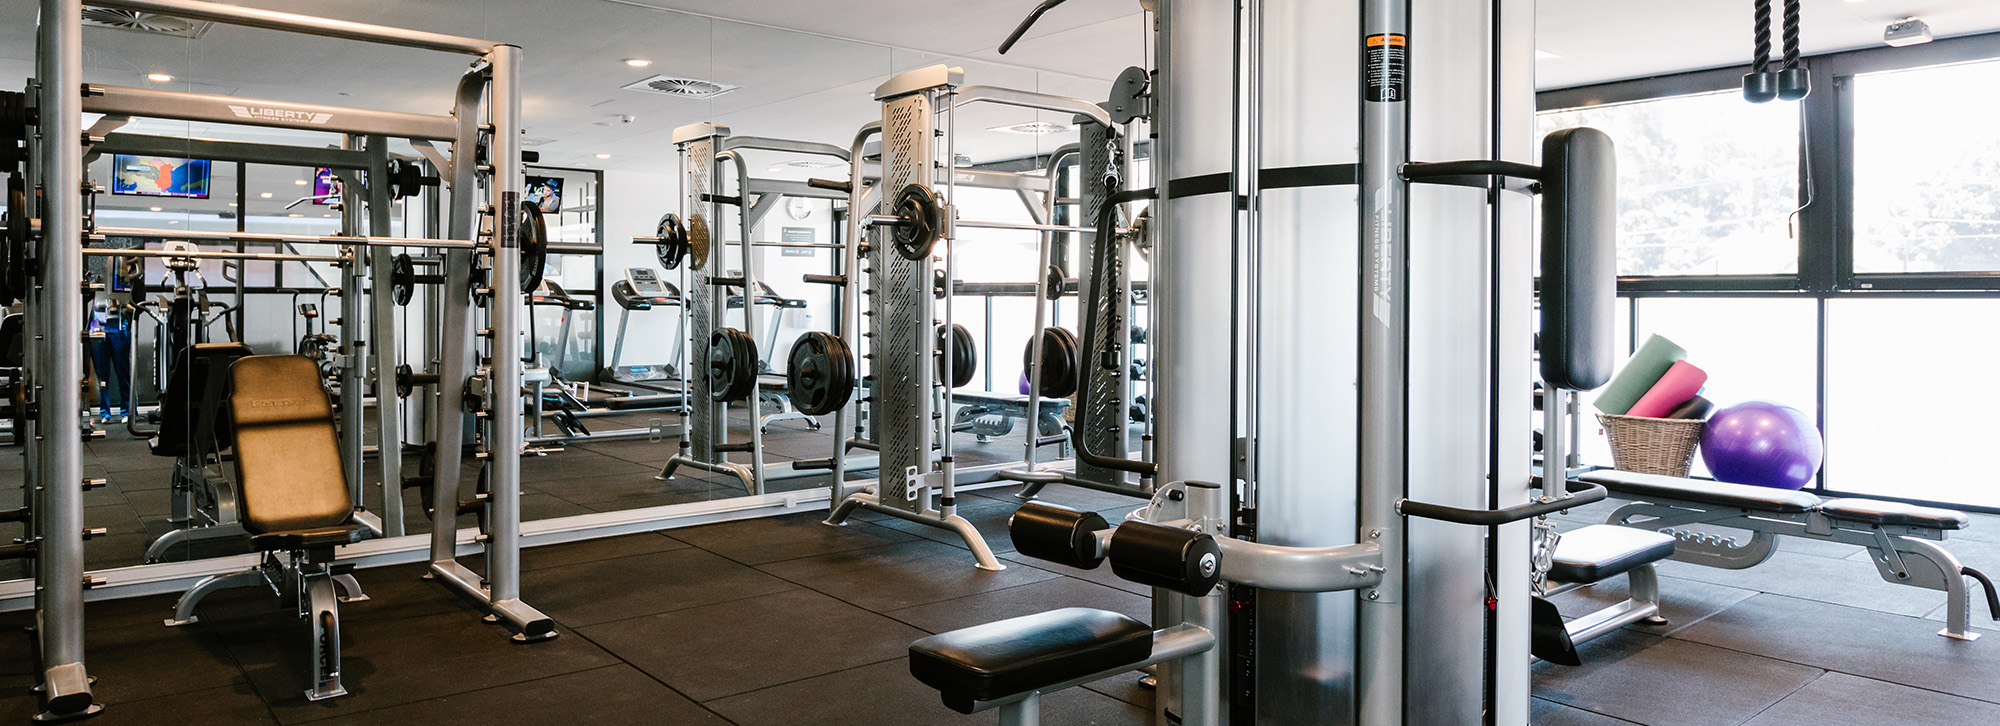 Comprehensive Gym Equipment